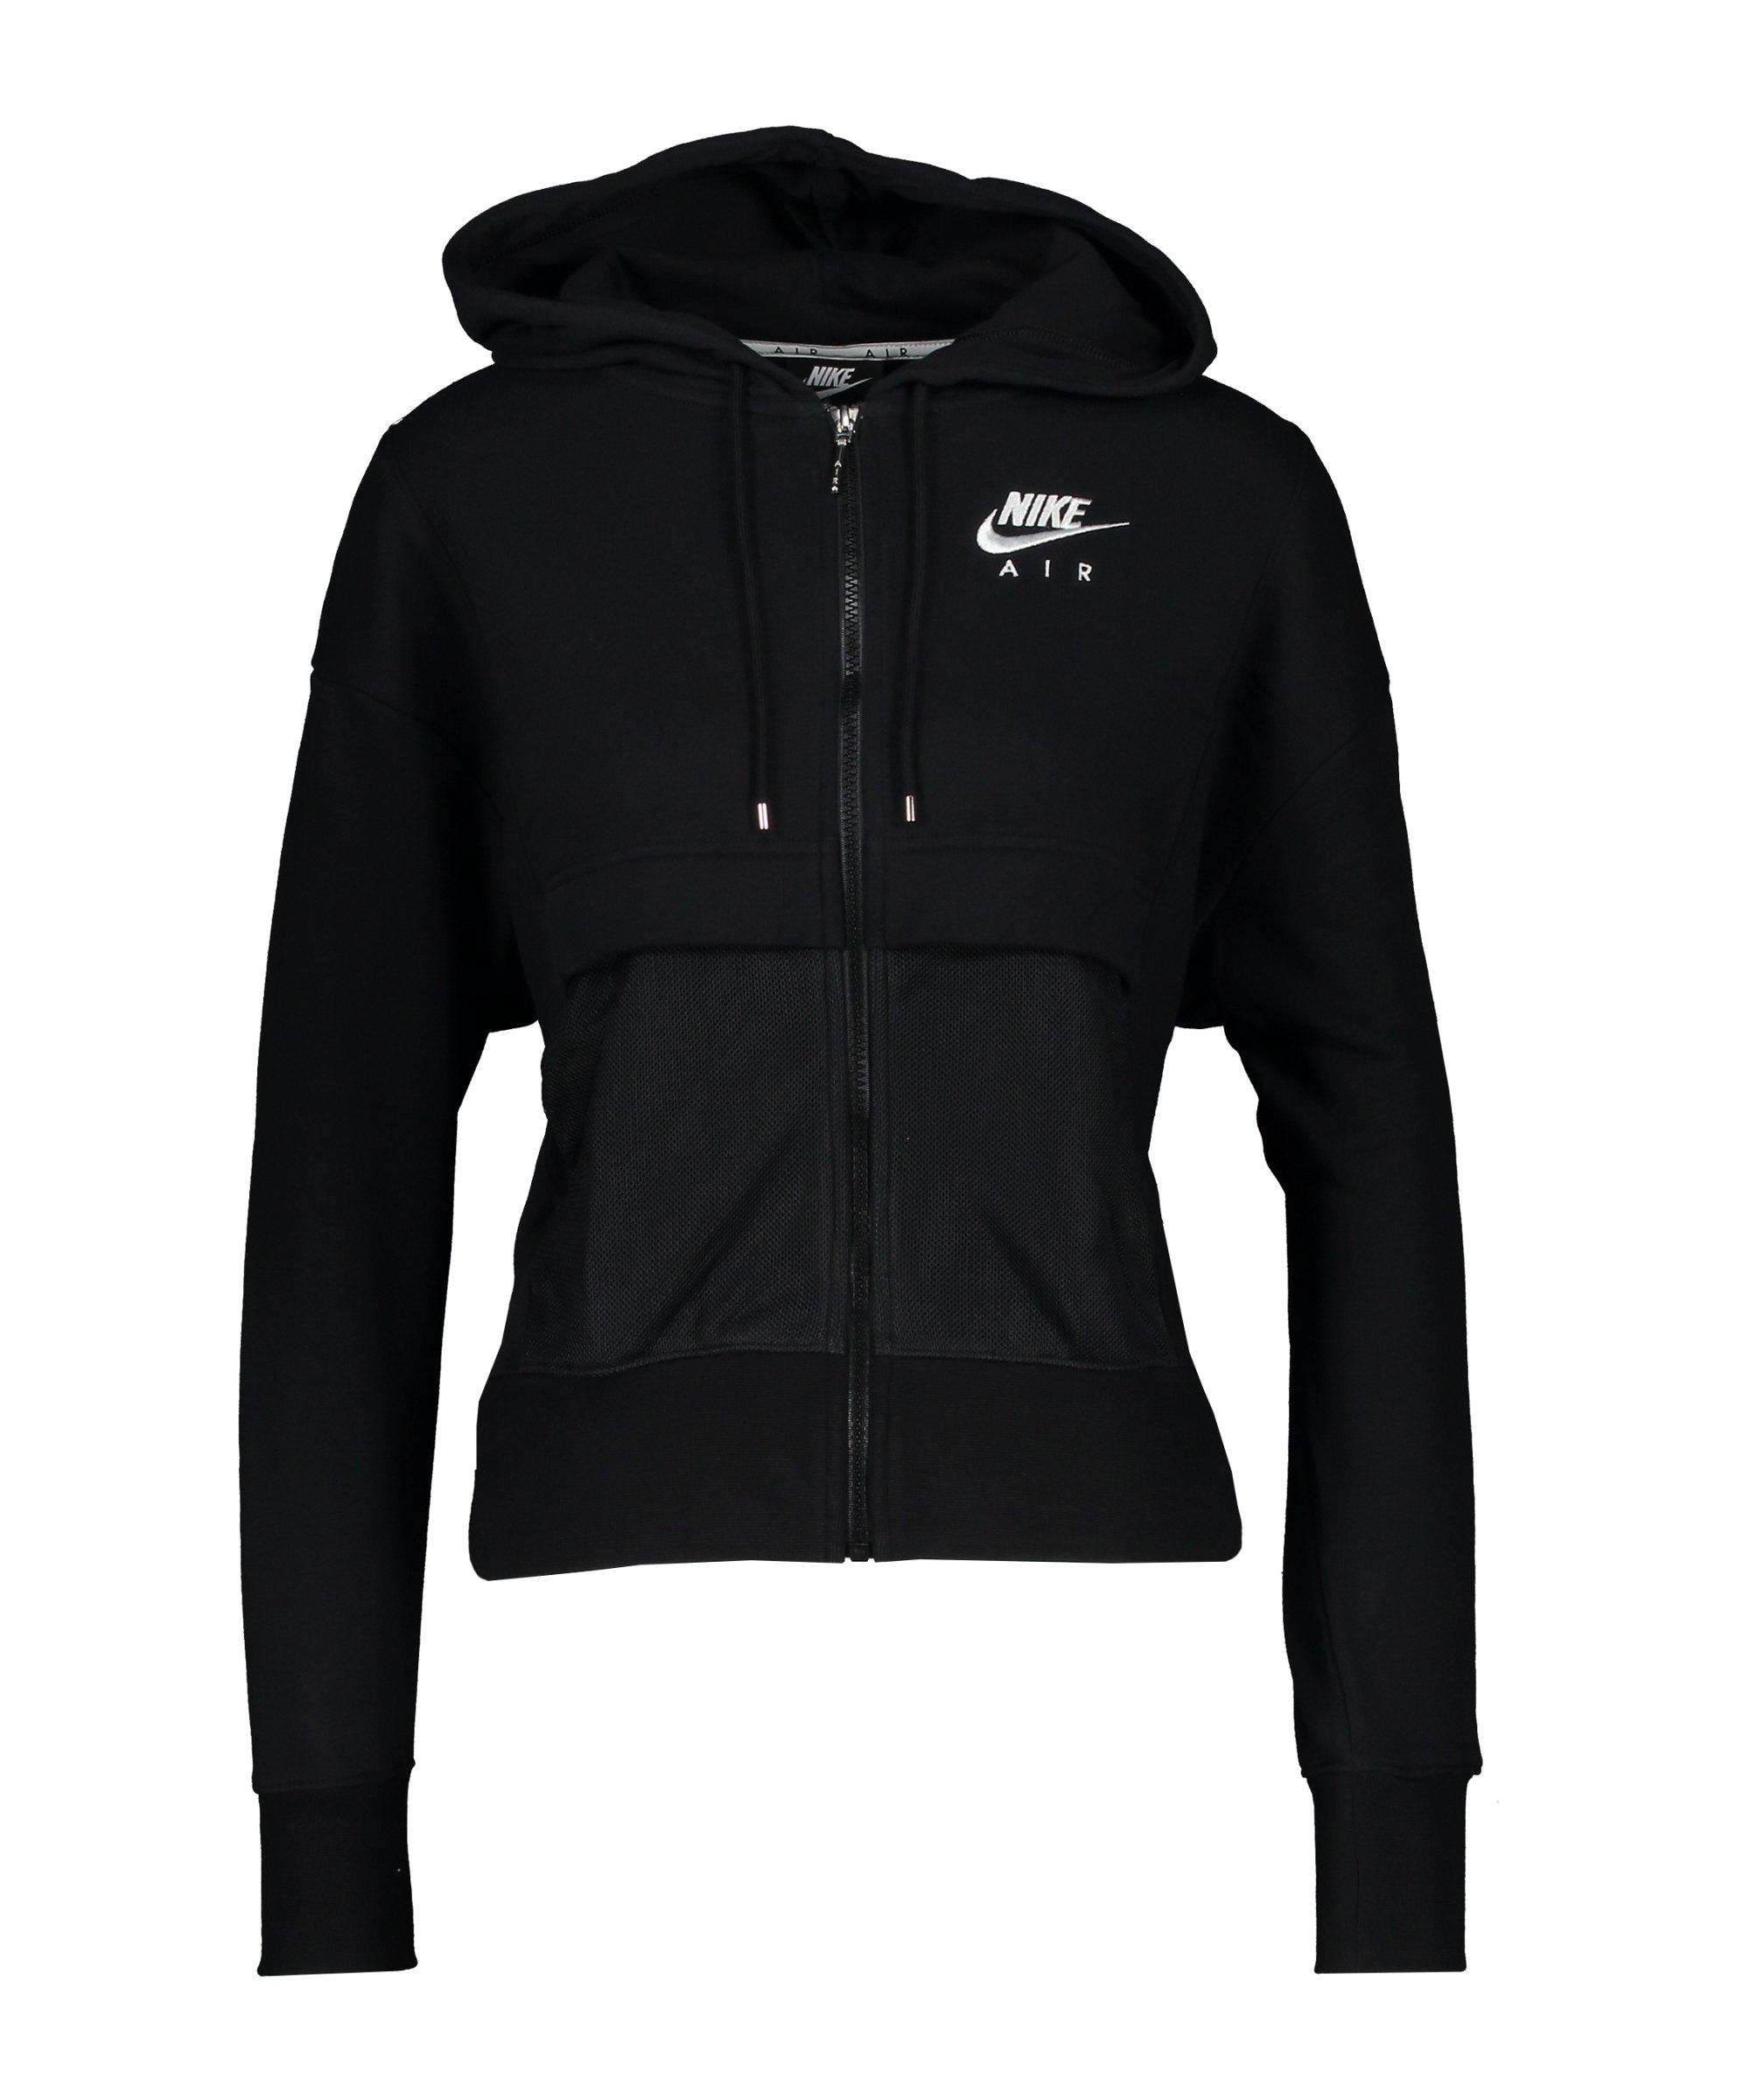 Nike Air Kapuzenjacke Damen Schwarz Weiss F010 - schwarz